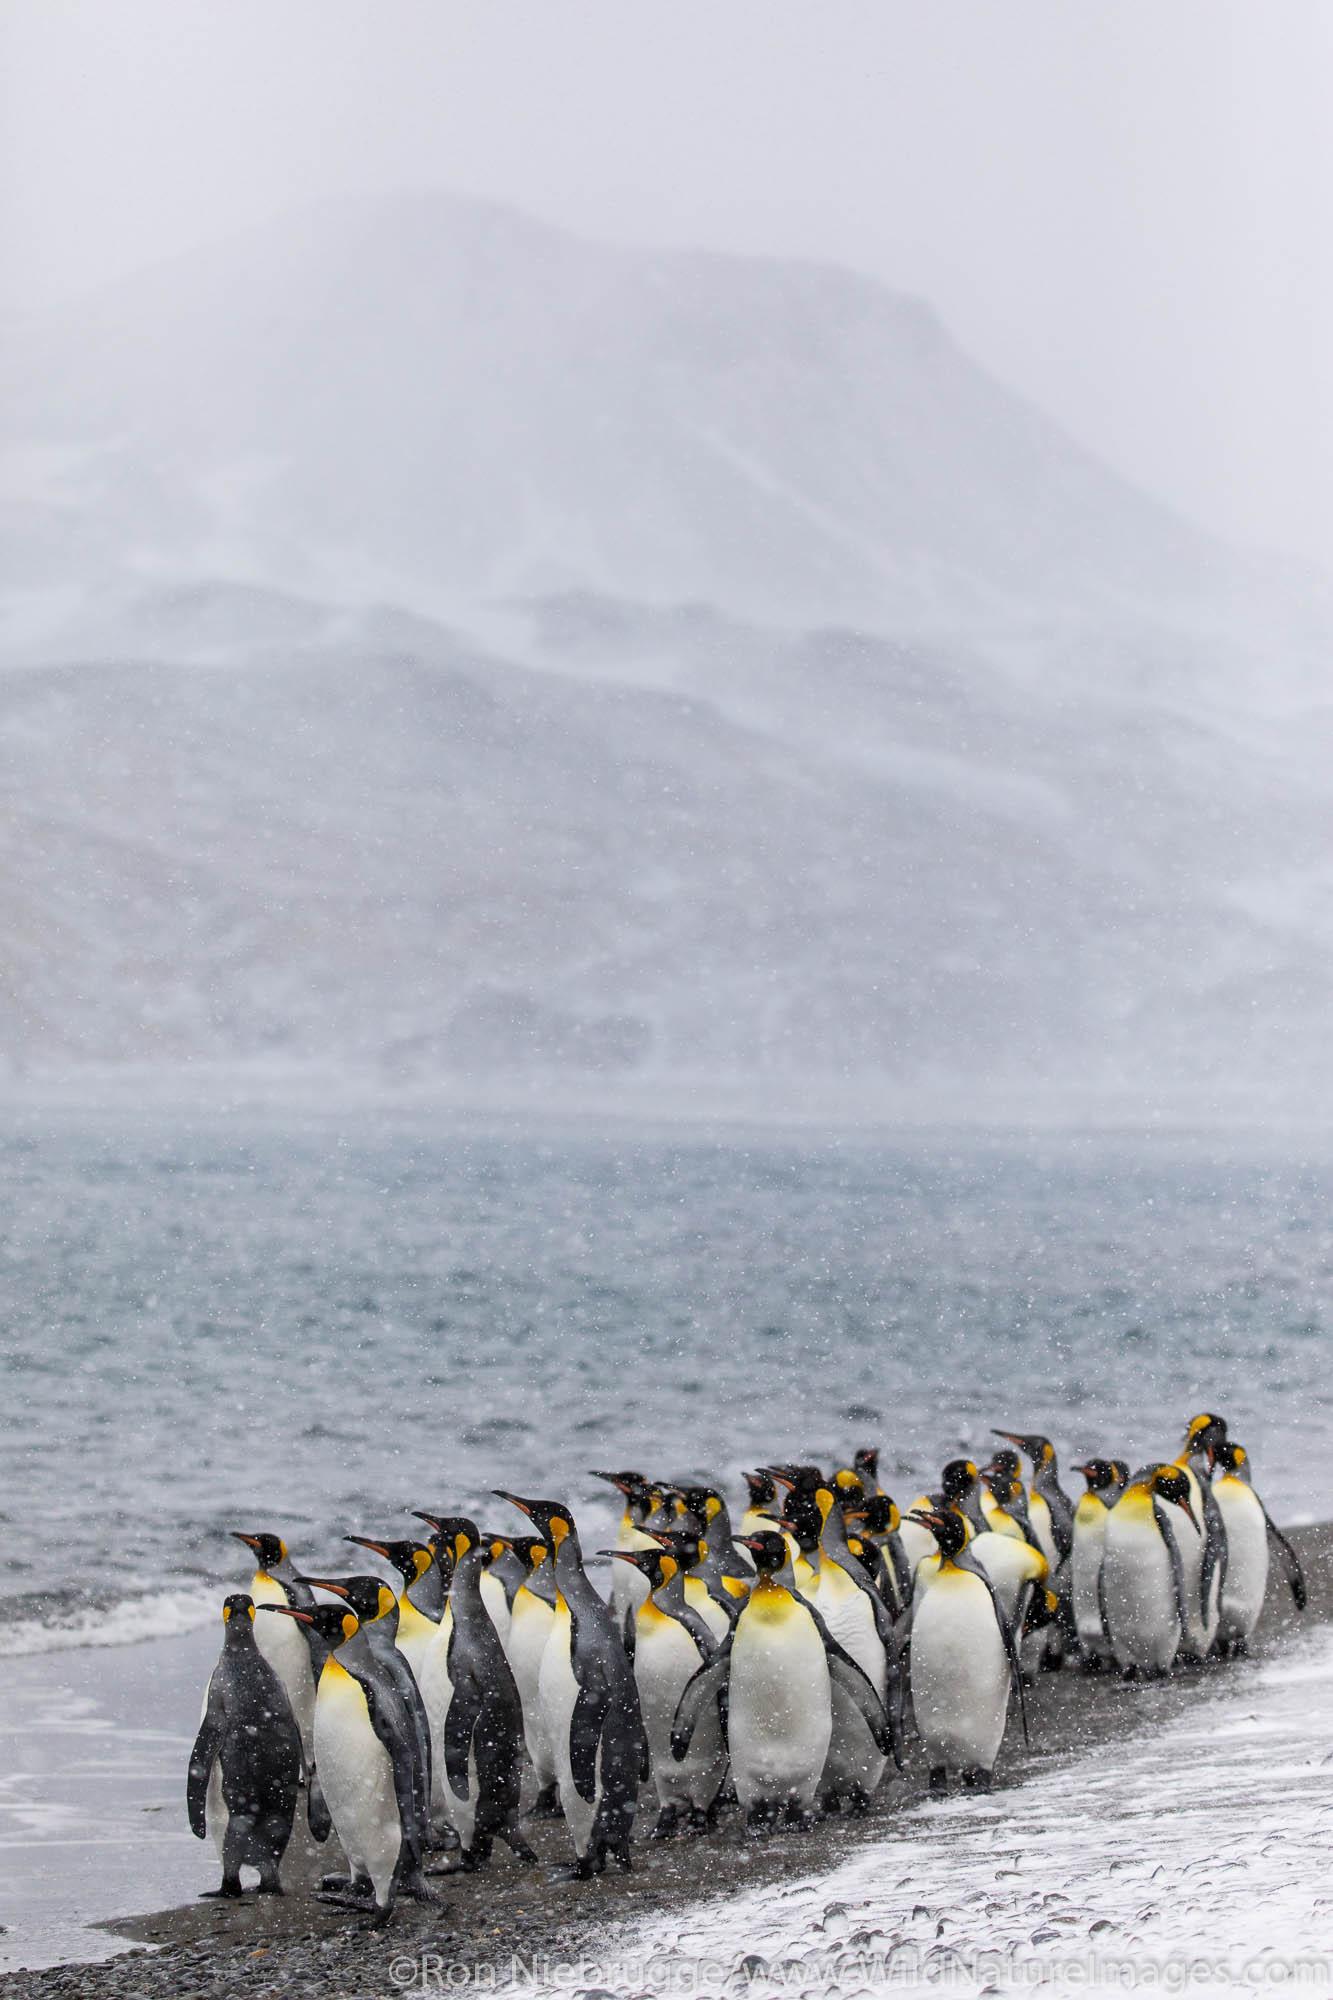 King Penguins, Fortuna Bay, South Georgia, Antarctica.